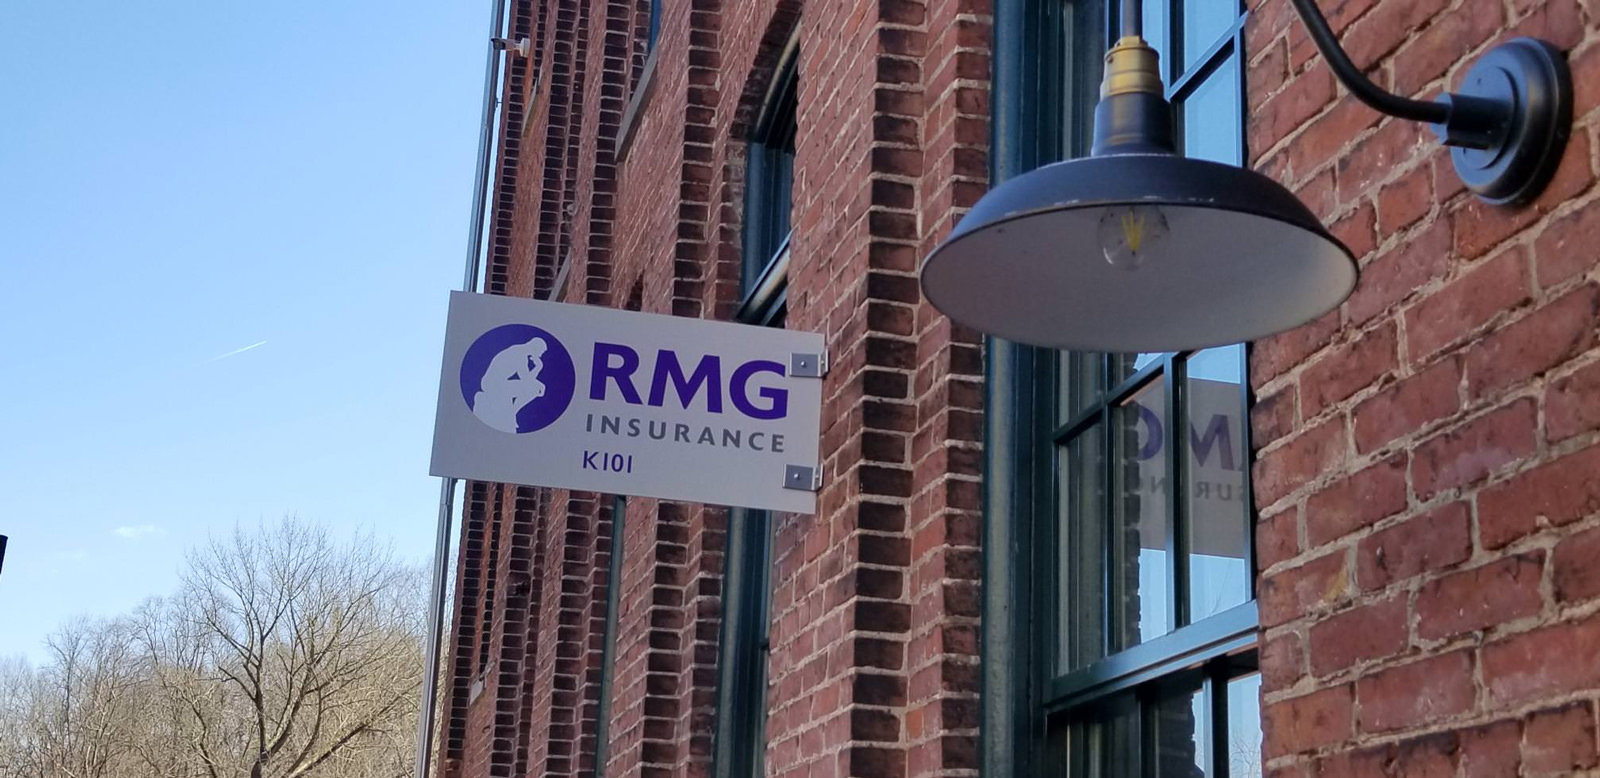 RMG Insurance